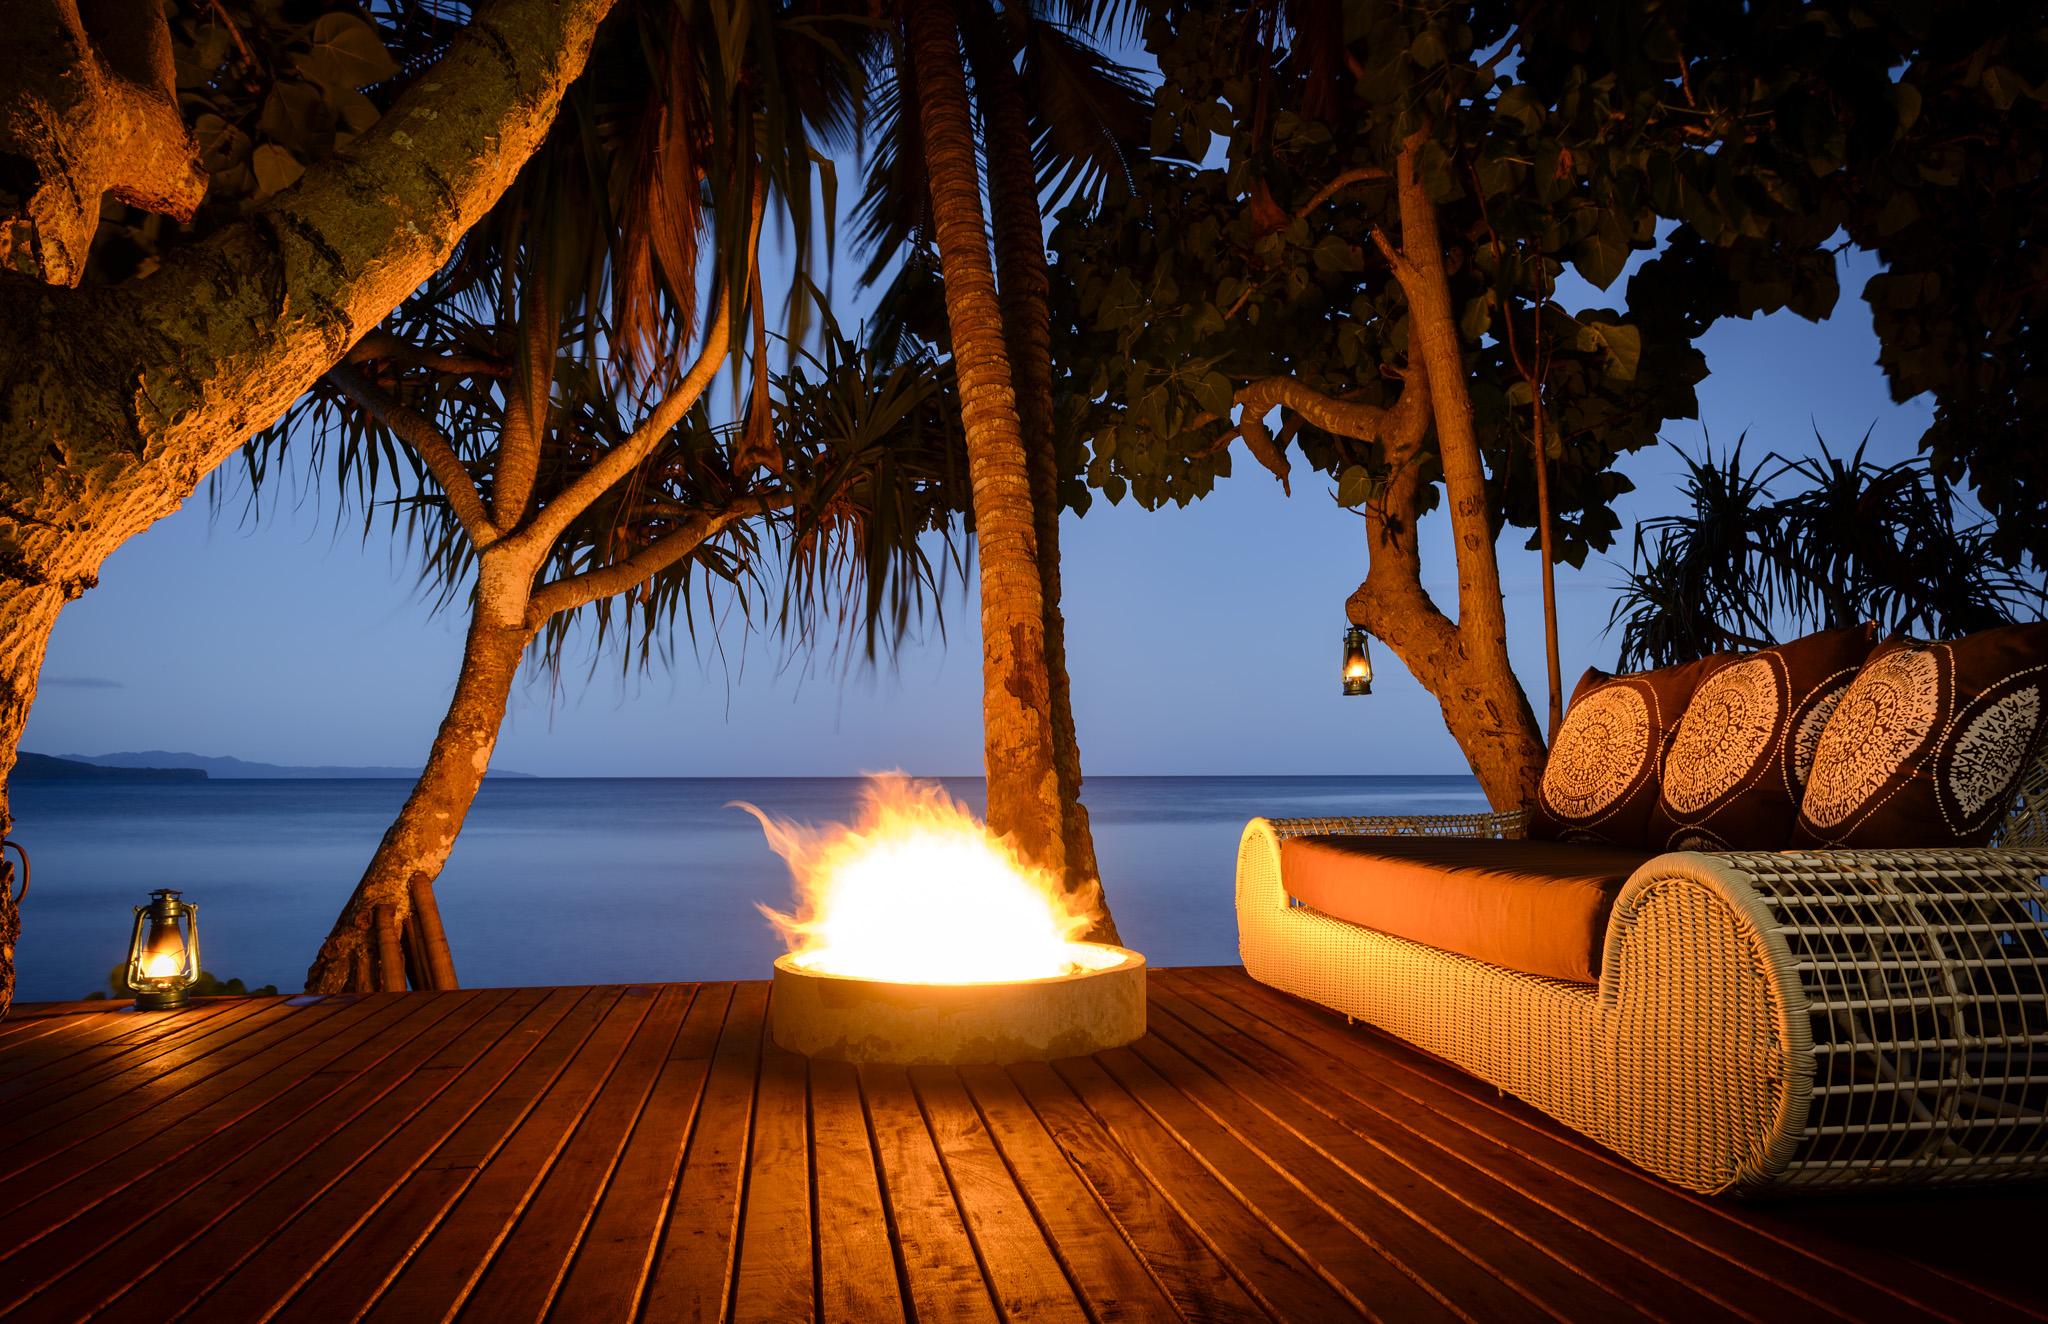 Remote Resort Fiji Firepit deck.jpg